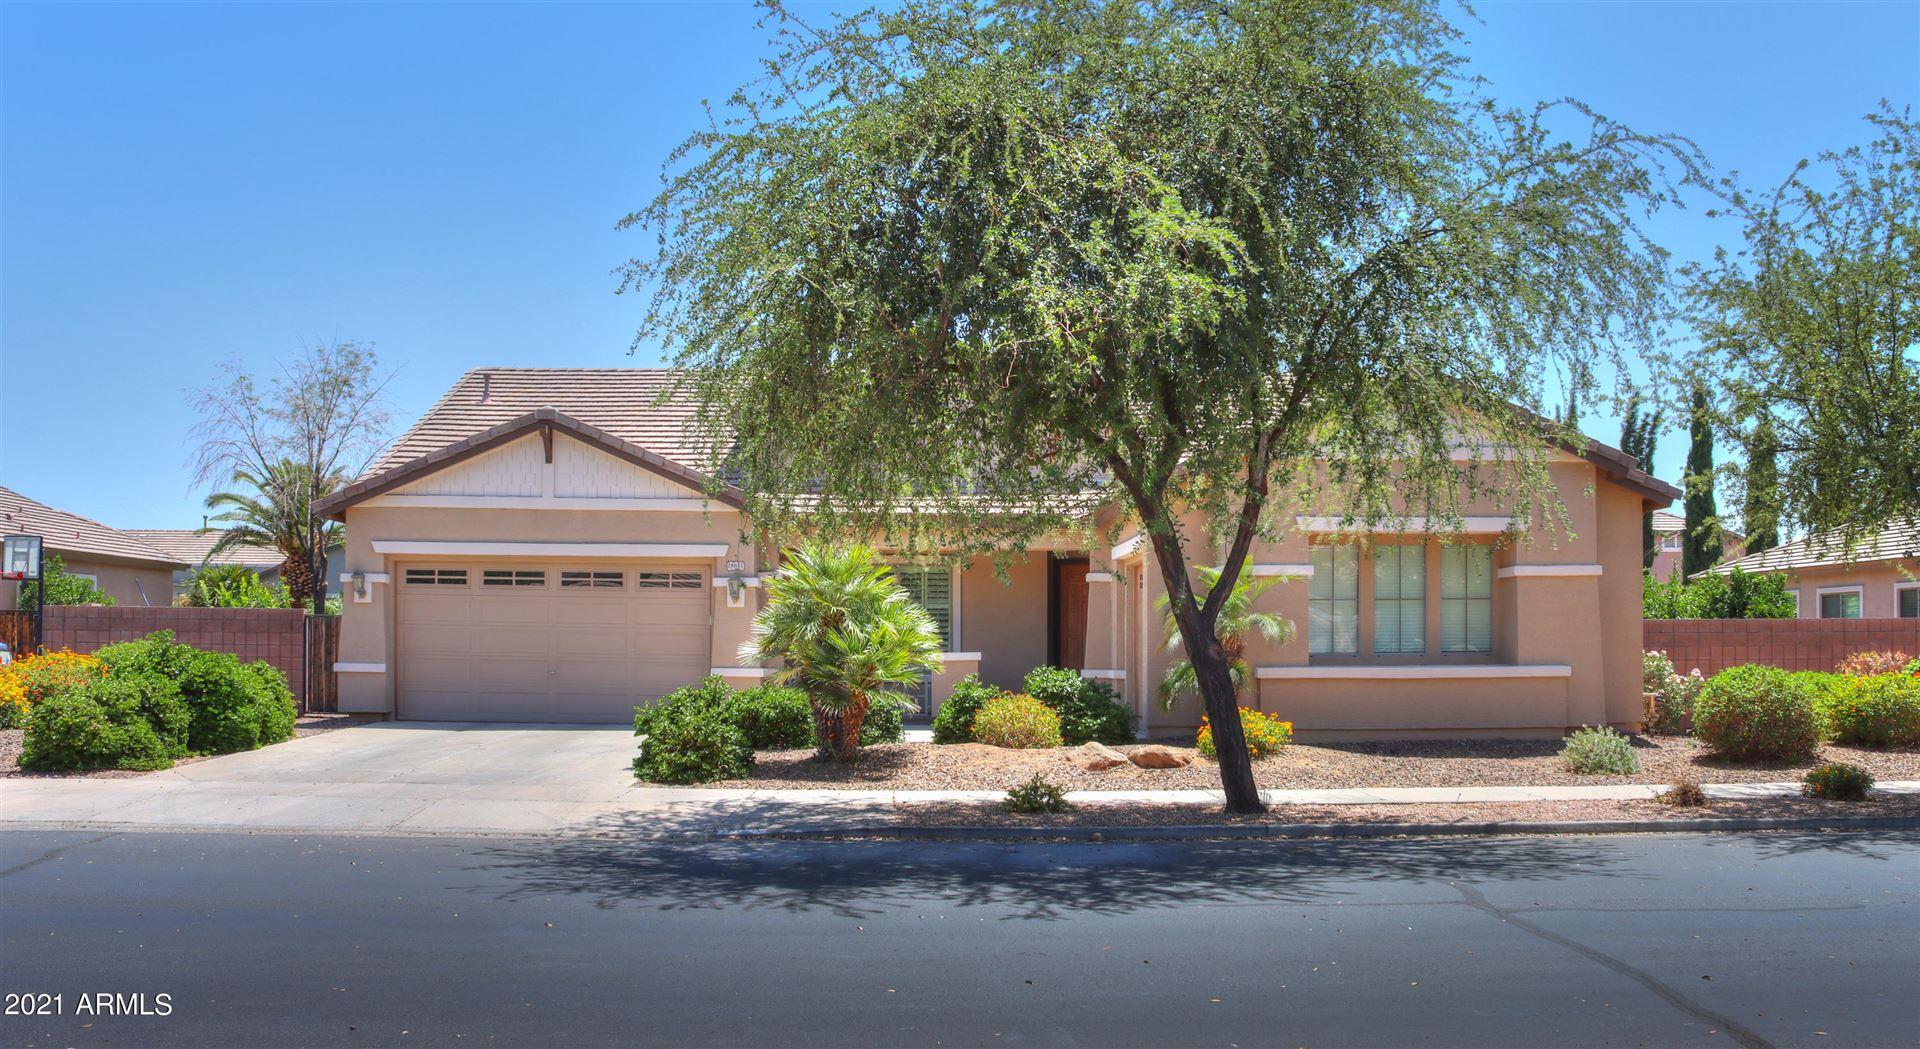 Photo of 18631 E CANARY Way, Queen Creek, AZ 85142 (MLS # 6230853)